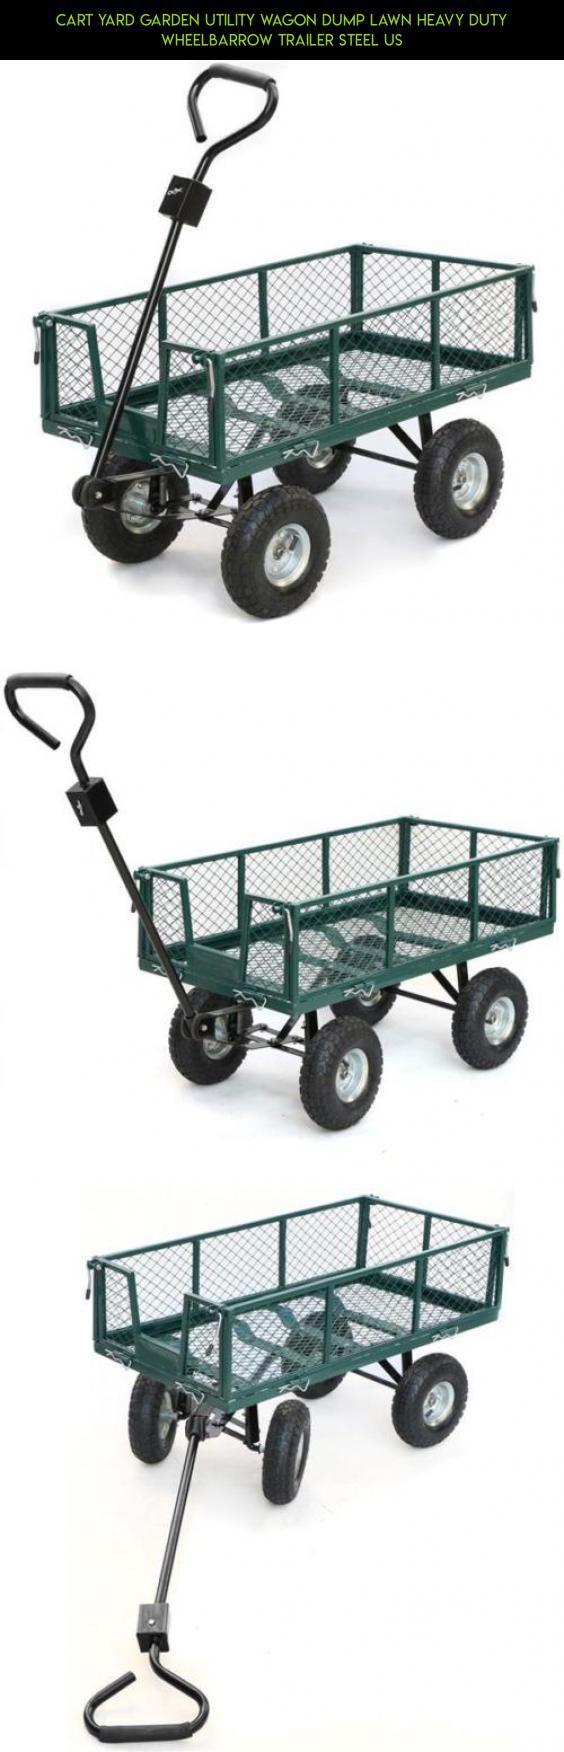 Cart Yard Garden Utility Wagon Dump Lawn Heavy Duty Wheelbarrow Trailer Steel US #racing #camera #tech #technology #drone #cart #gardening #parts #products #gadgets #shopping #fpv #utility #kit #plans